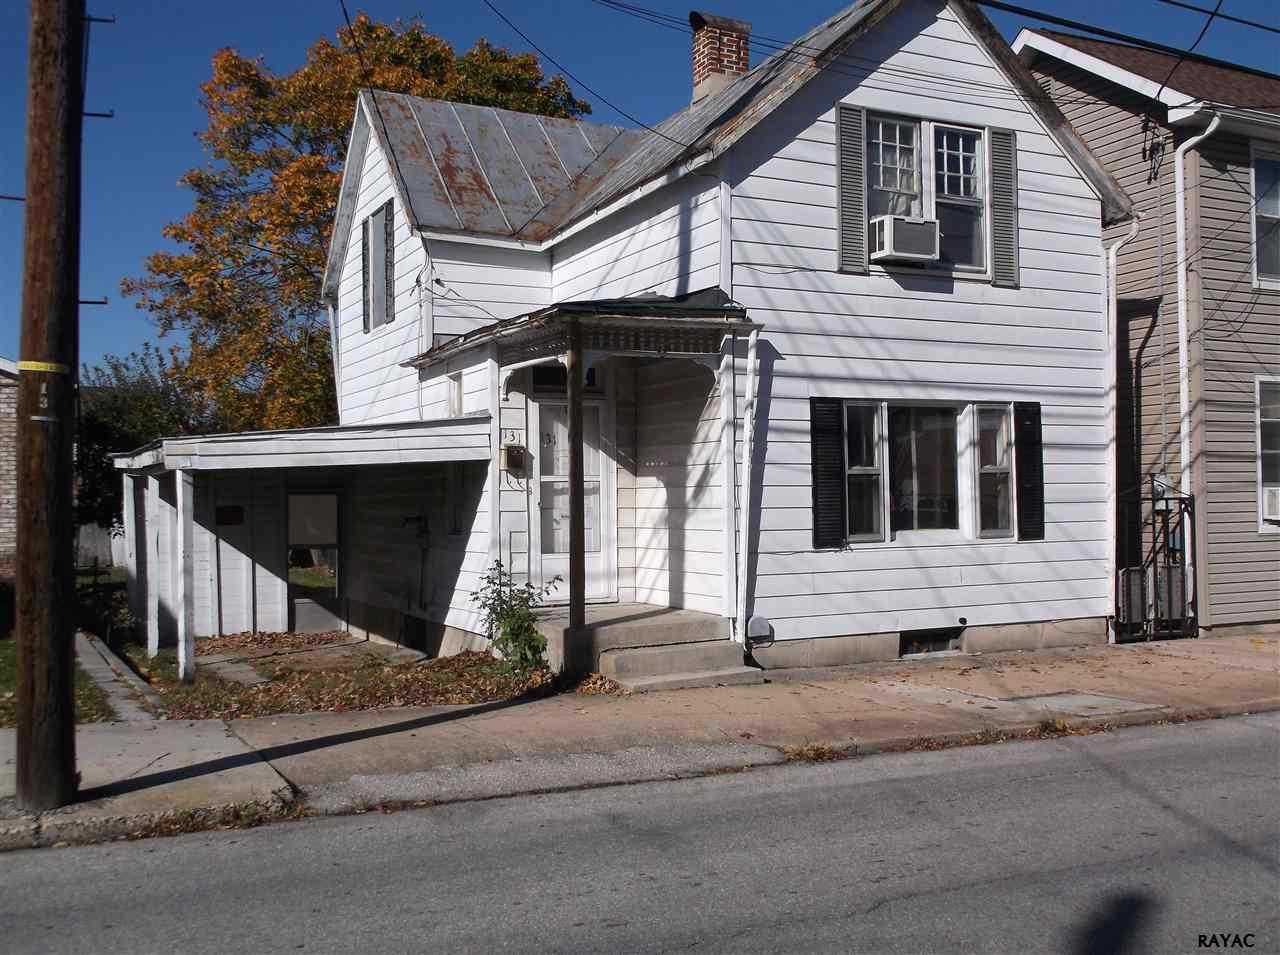 131 West St, Gettysburg, PA 17325